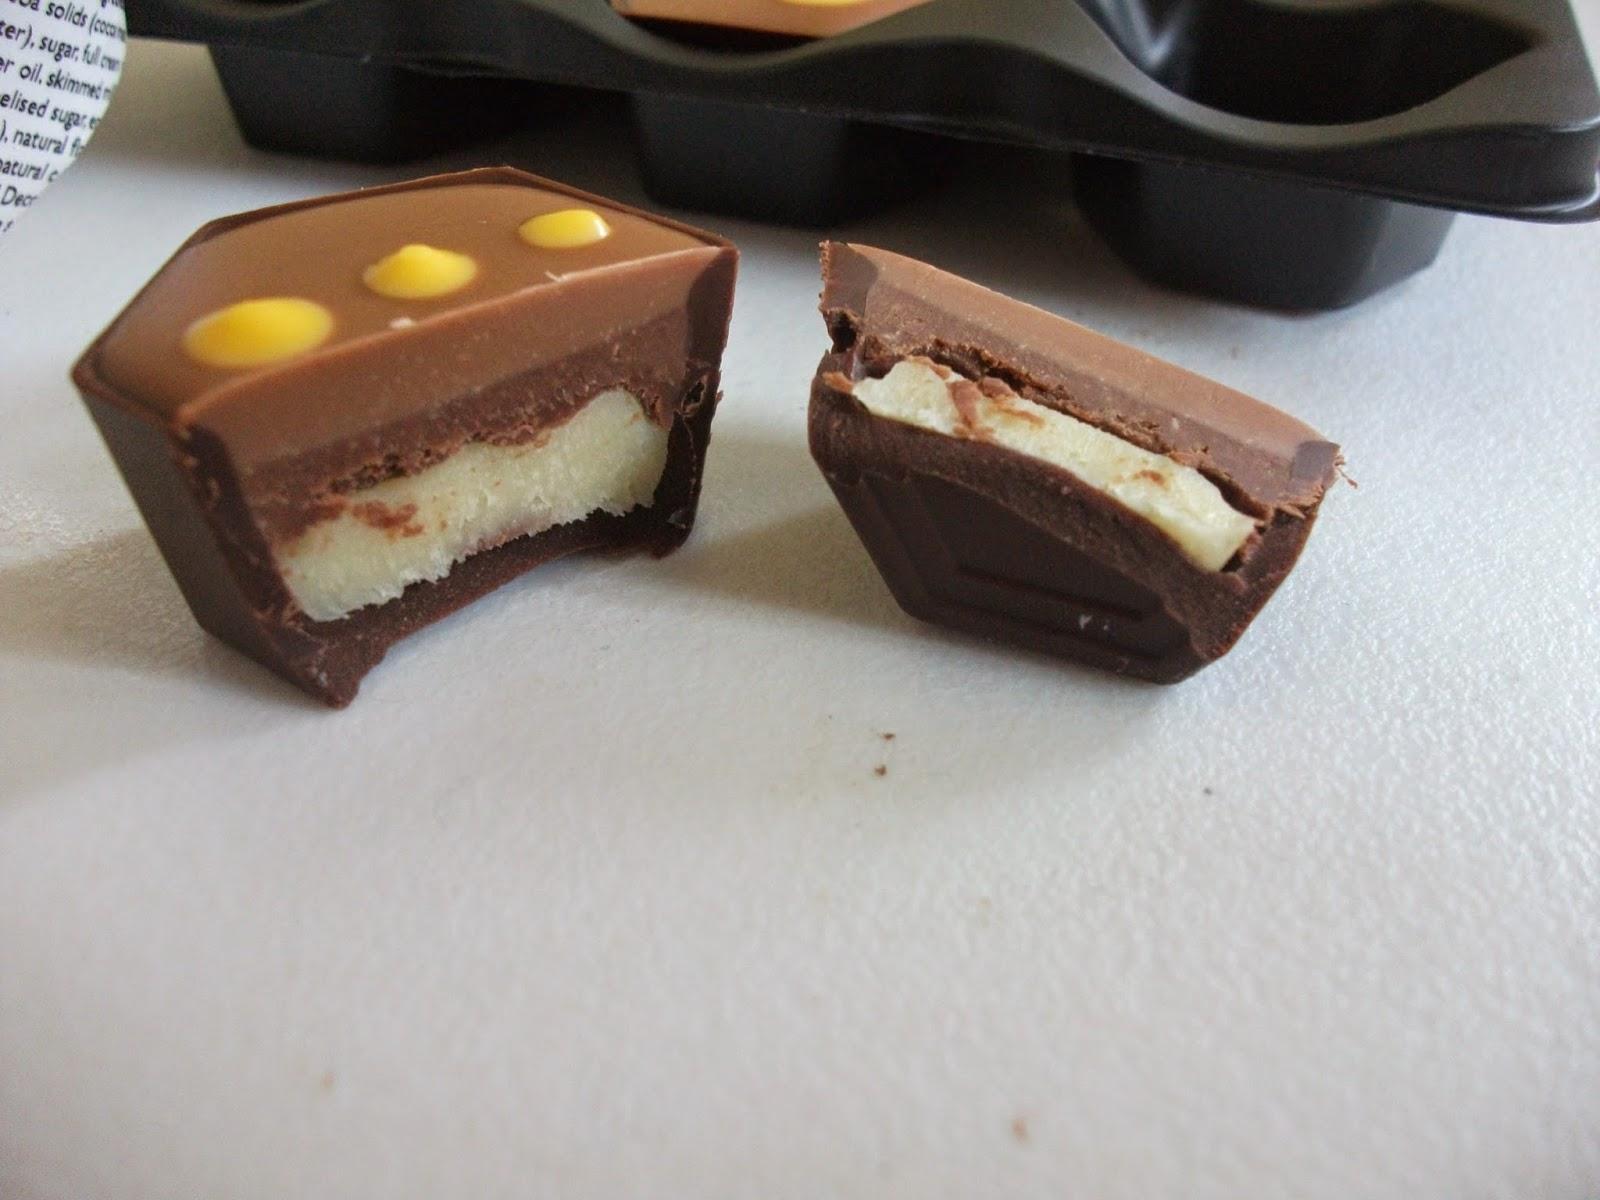 ... Snack Reviews: Hotel Chocolat Salted Peanut & Banana Pralines Review